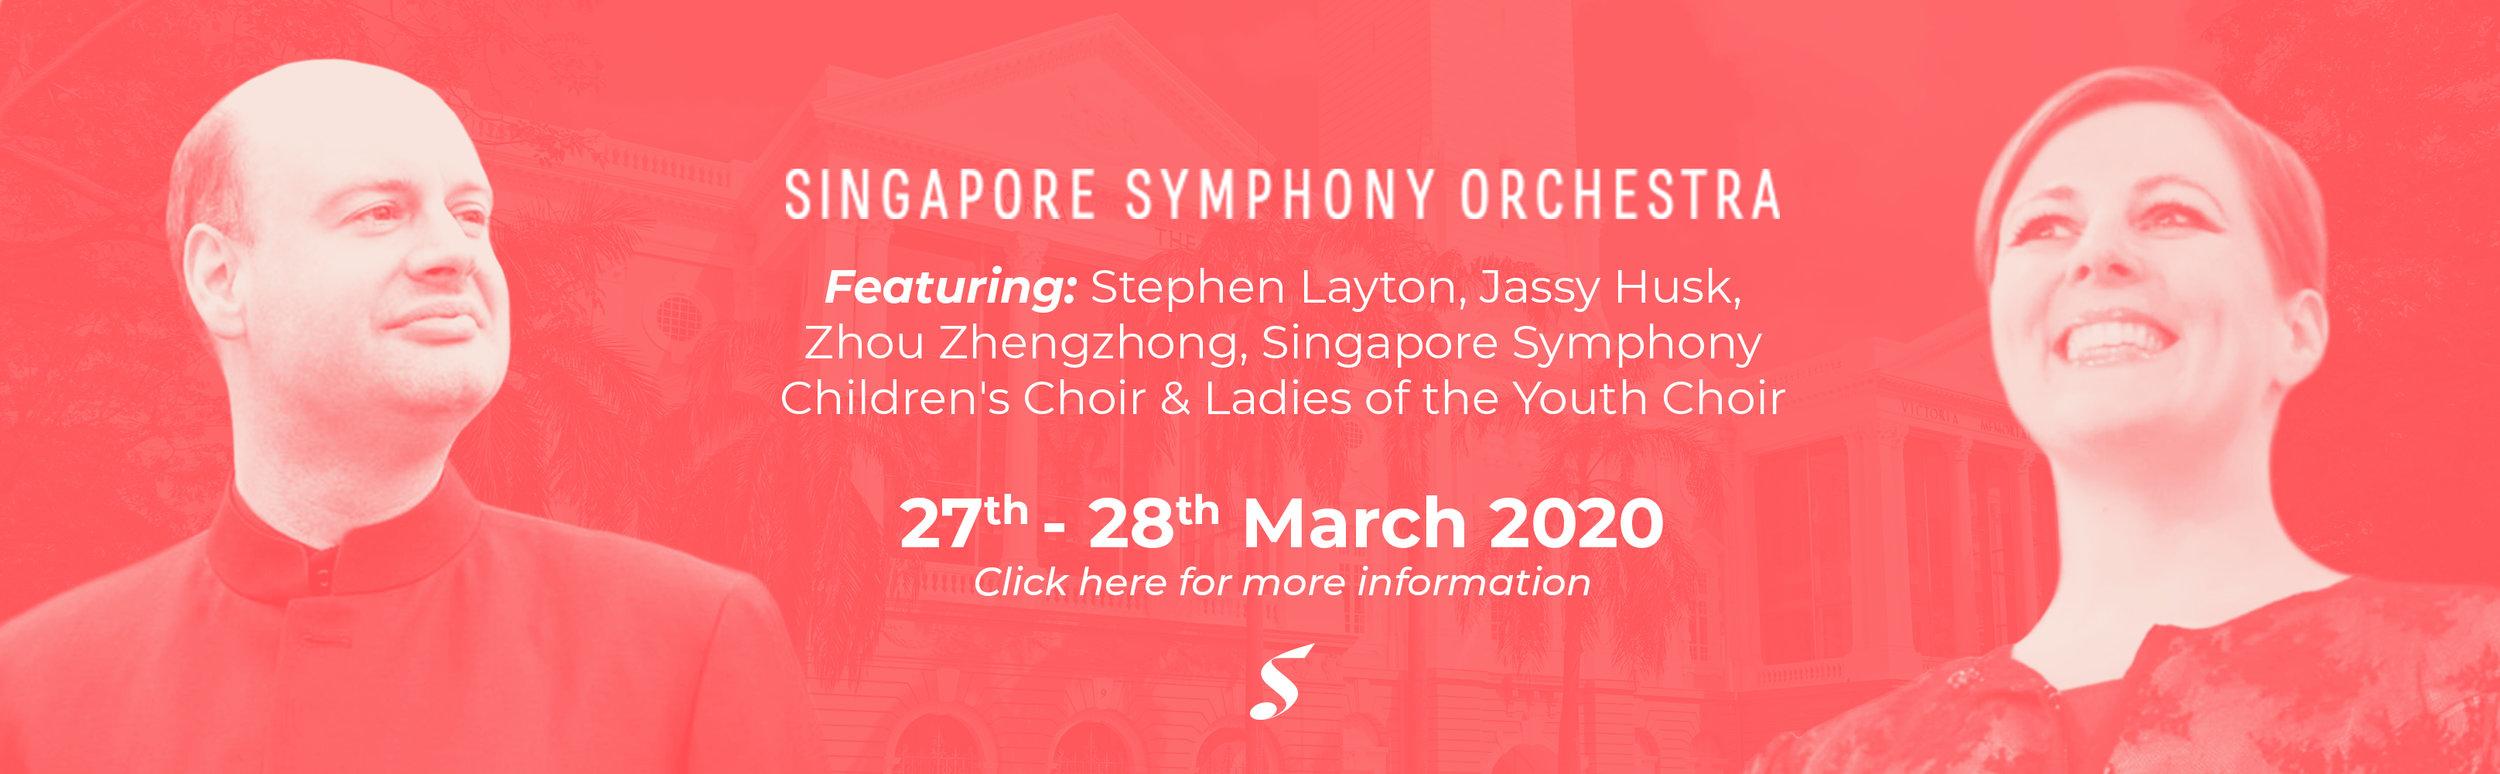 Singapore+Symphony+Orchestra+-+Jassy+Husk.jpeg